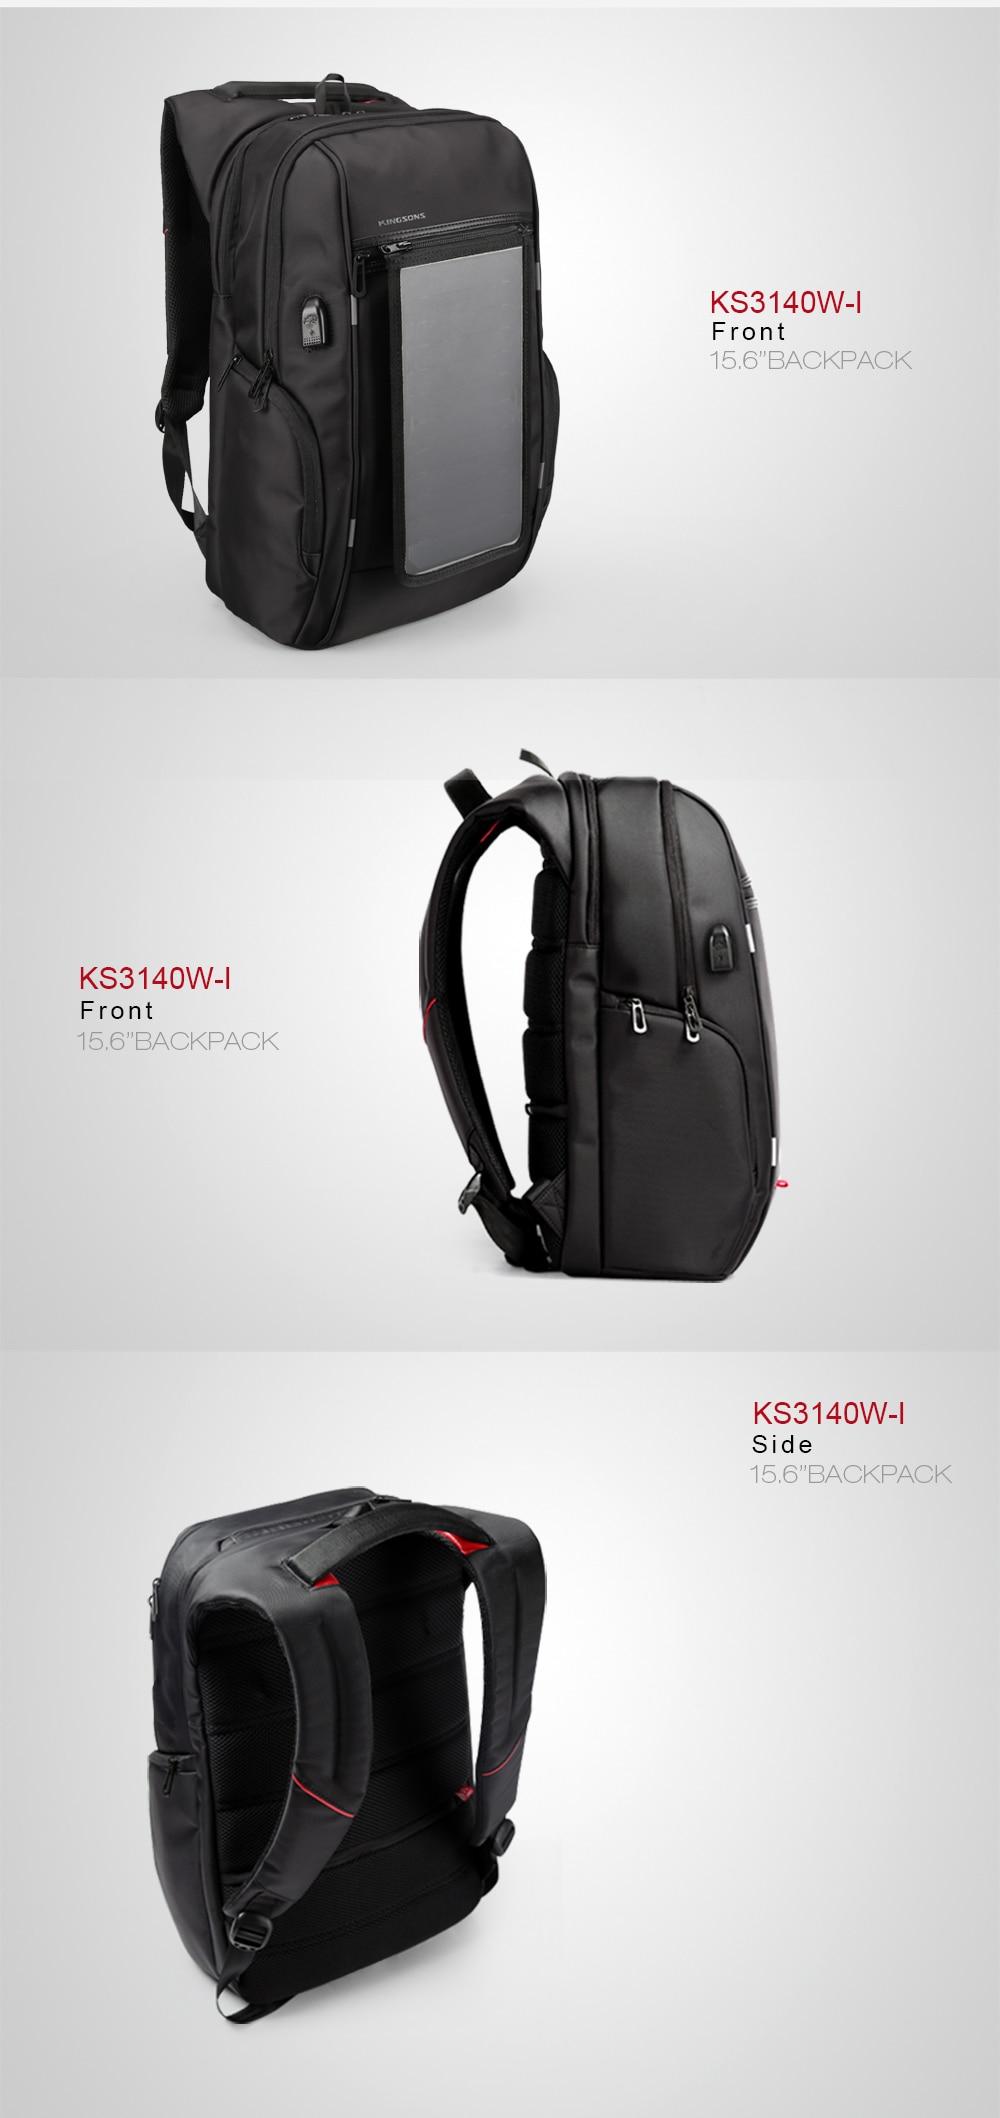 2017 Kingsons New Summer Mochila Solar Power Charger Backpack for Men Convenient Travel Daypack Waterproof Nylon 15″ Laptop Bag